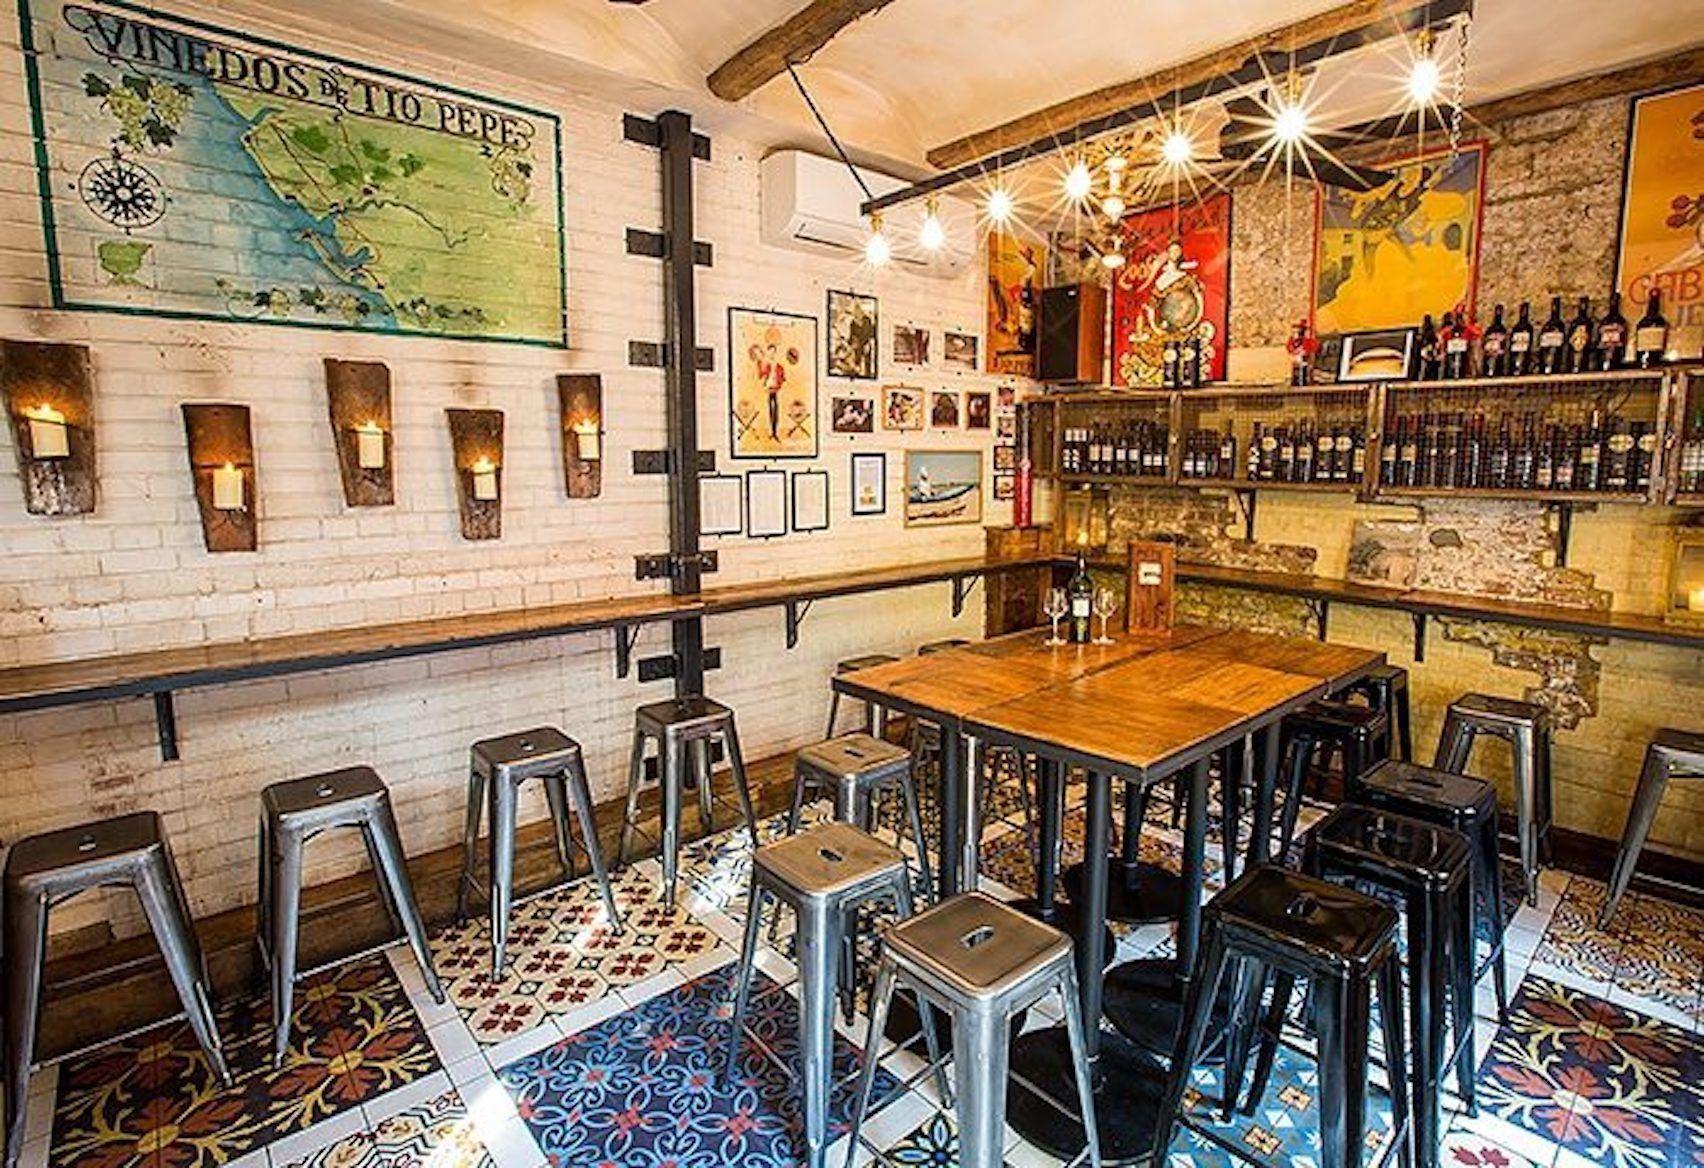 Bar Pepito, Bar Pepito